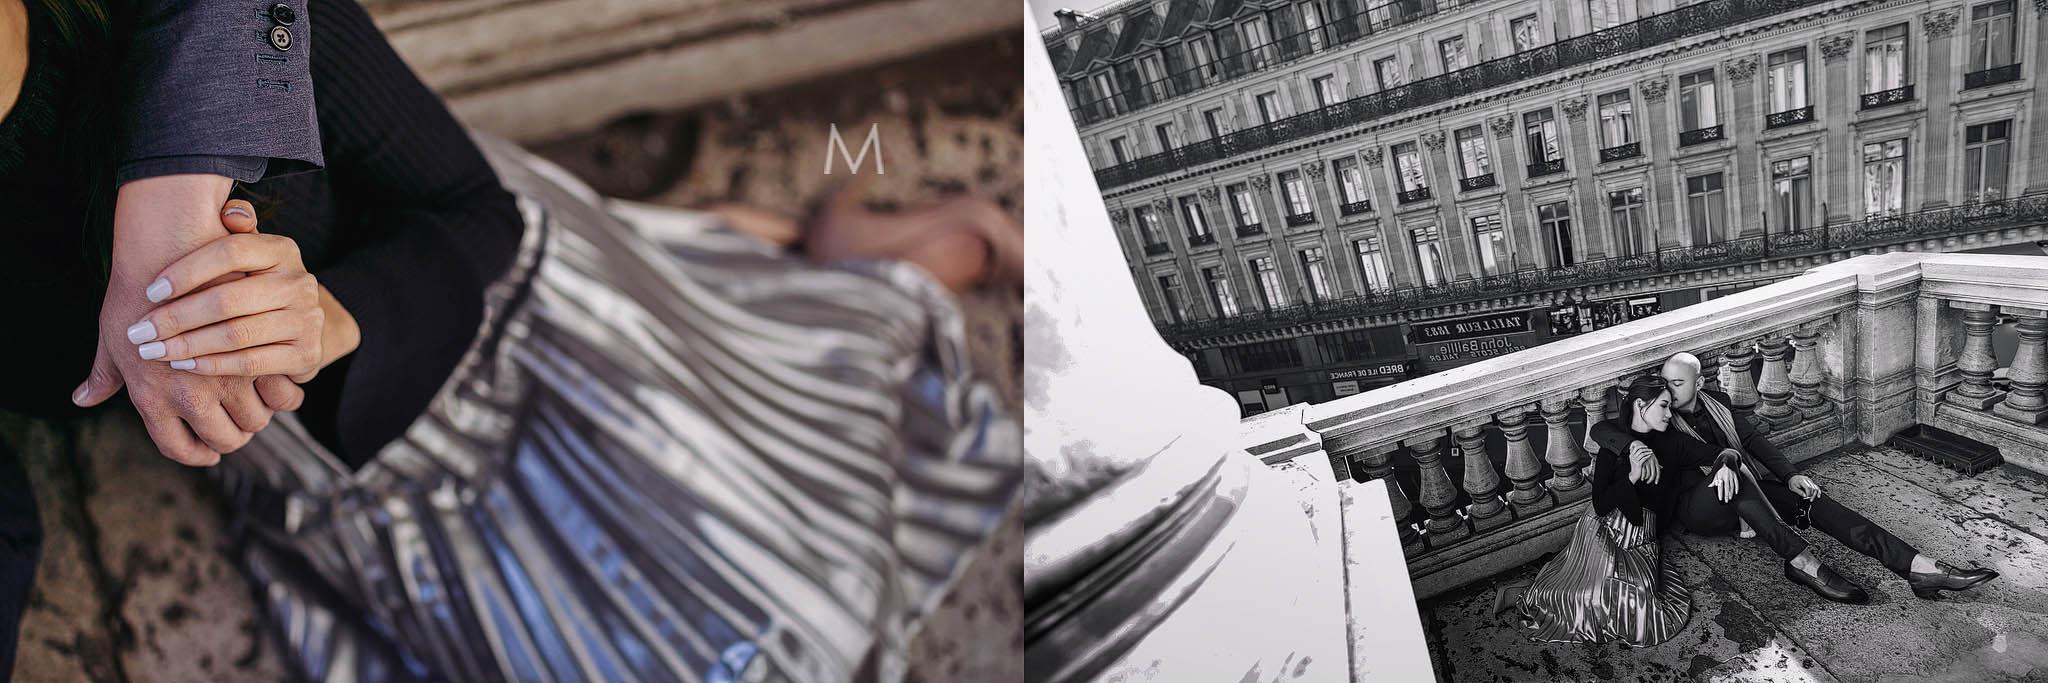 Paris_Mikki_Miko_043